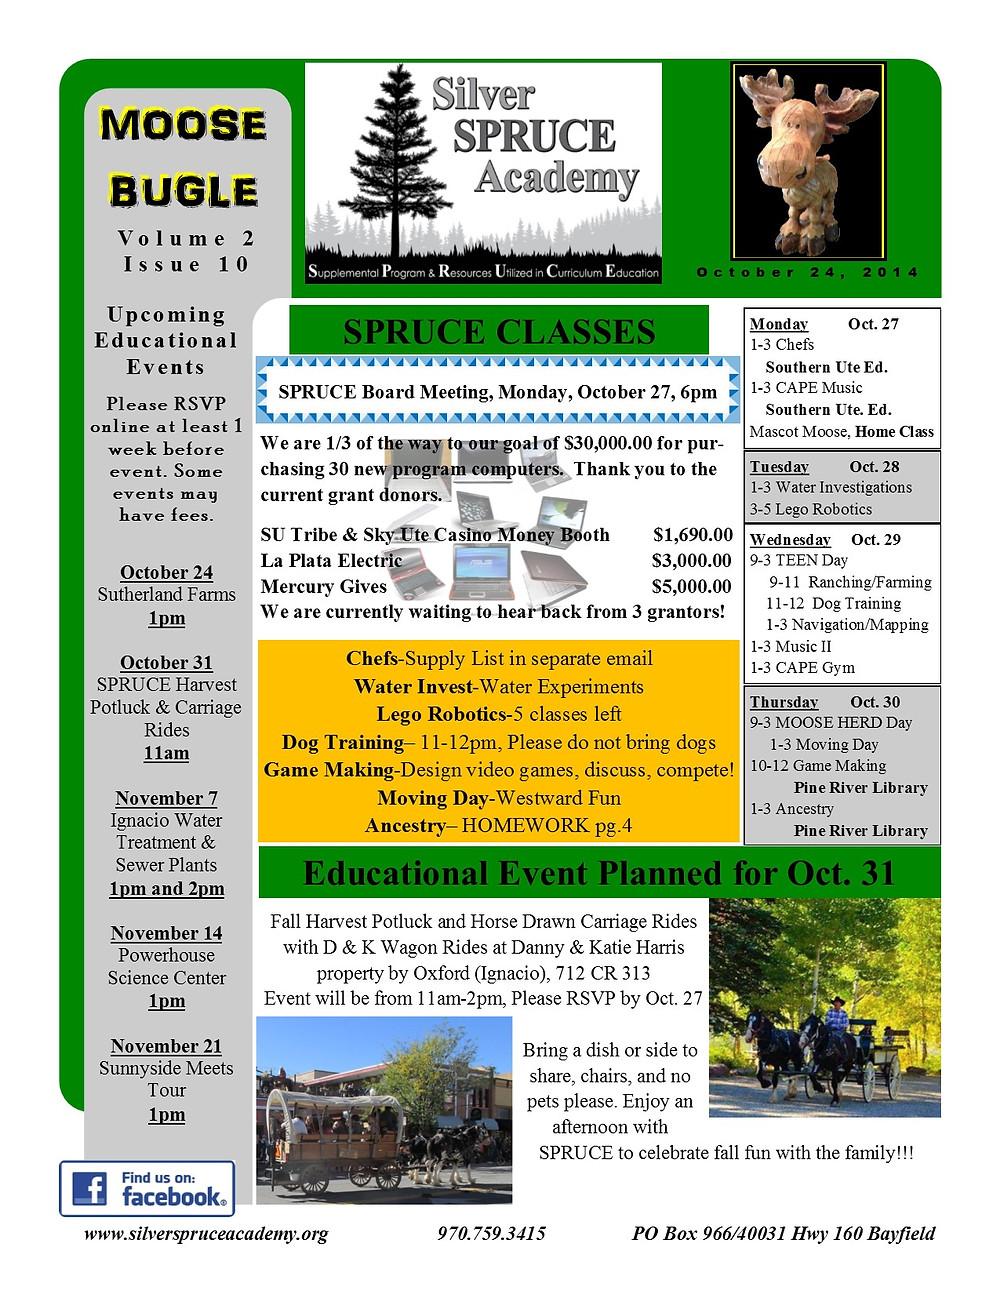 Moose_Bugle_10-24-14_page_1.jpg